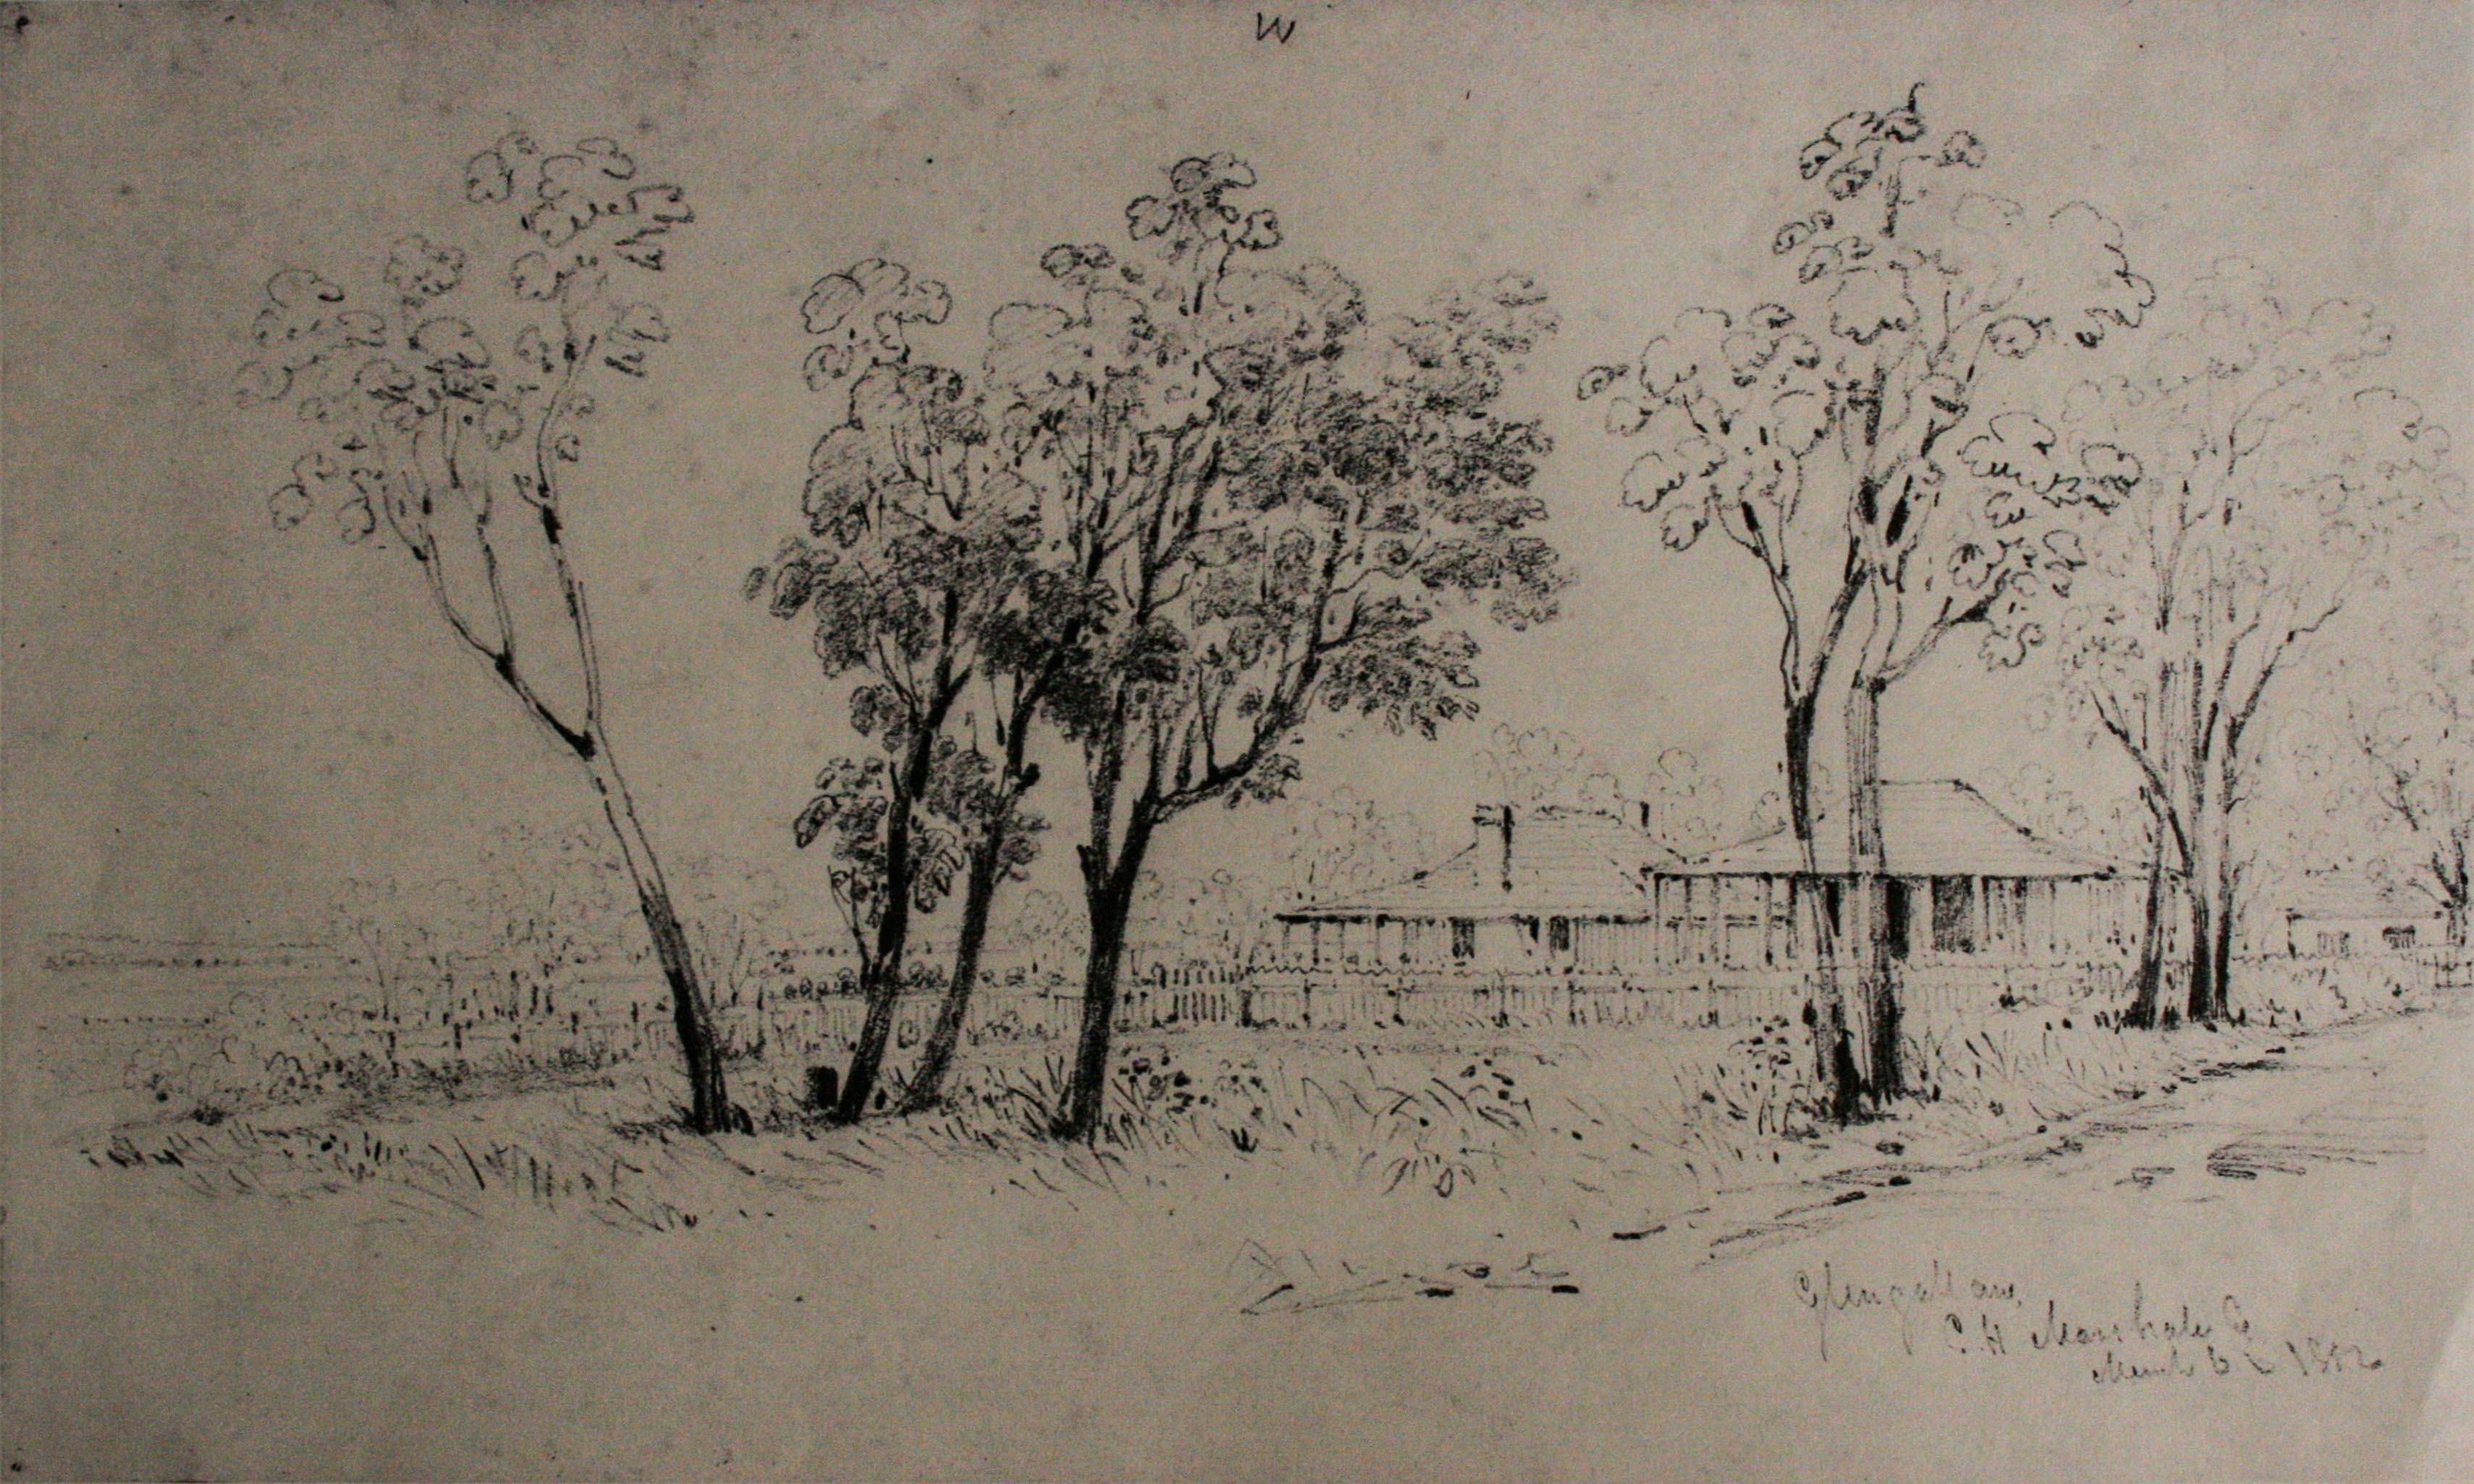 1852 C Martens Sketch